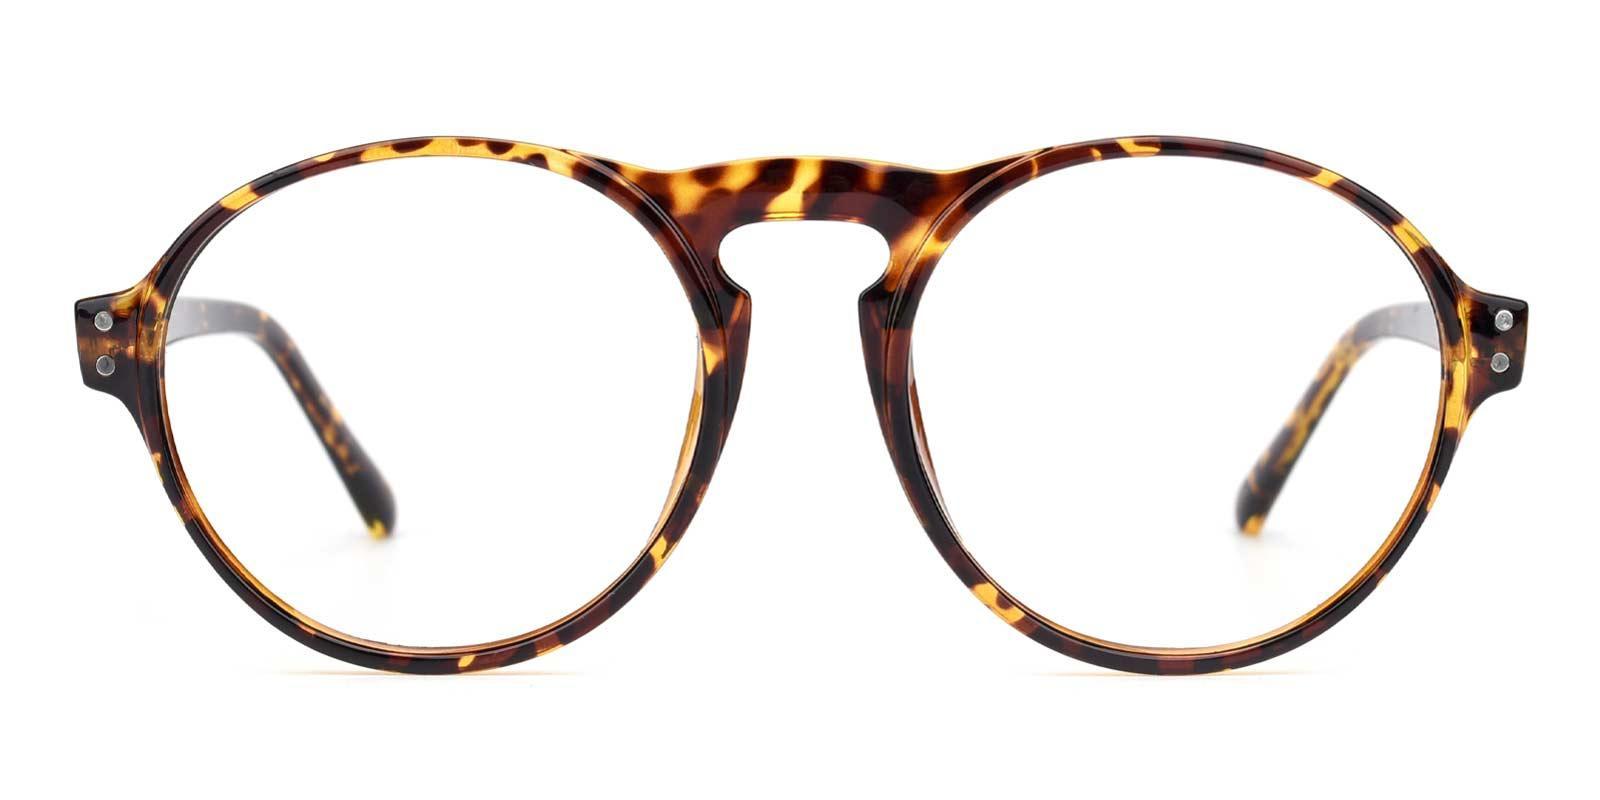 Lia-Tortoise-Round-Plastic-Eyeglasses-detail